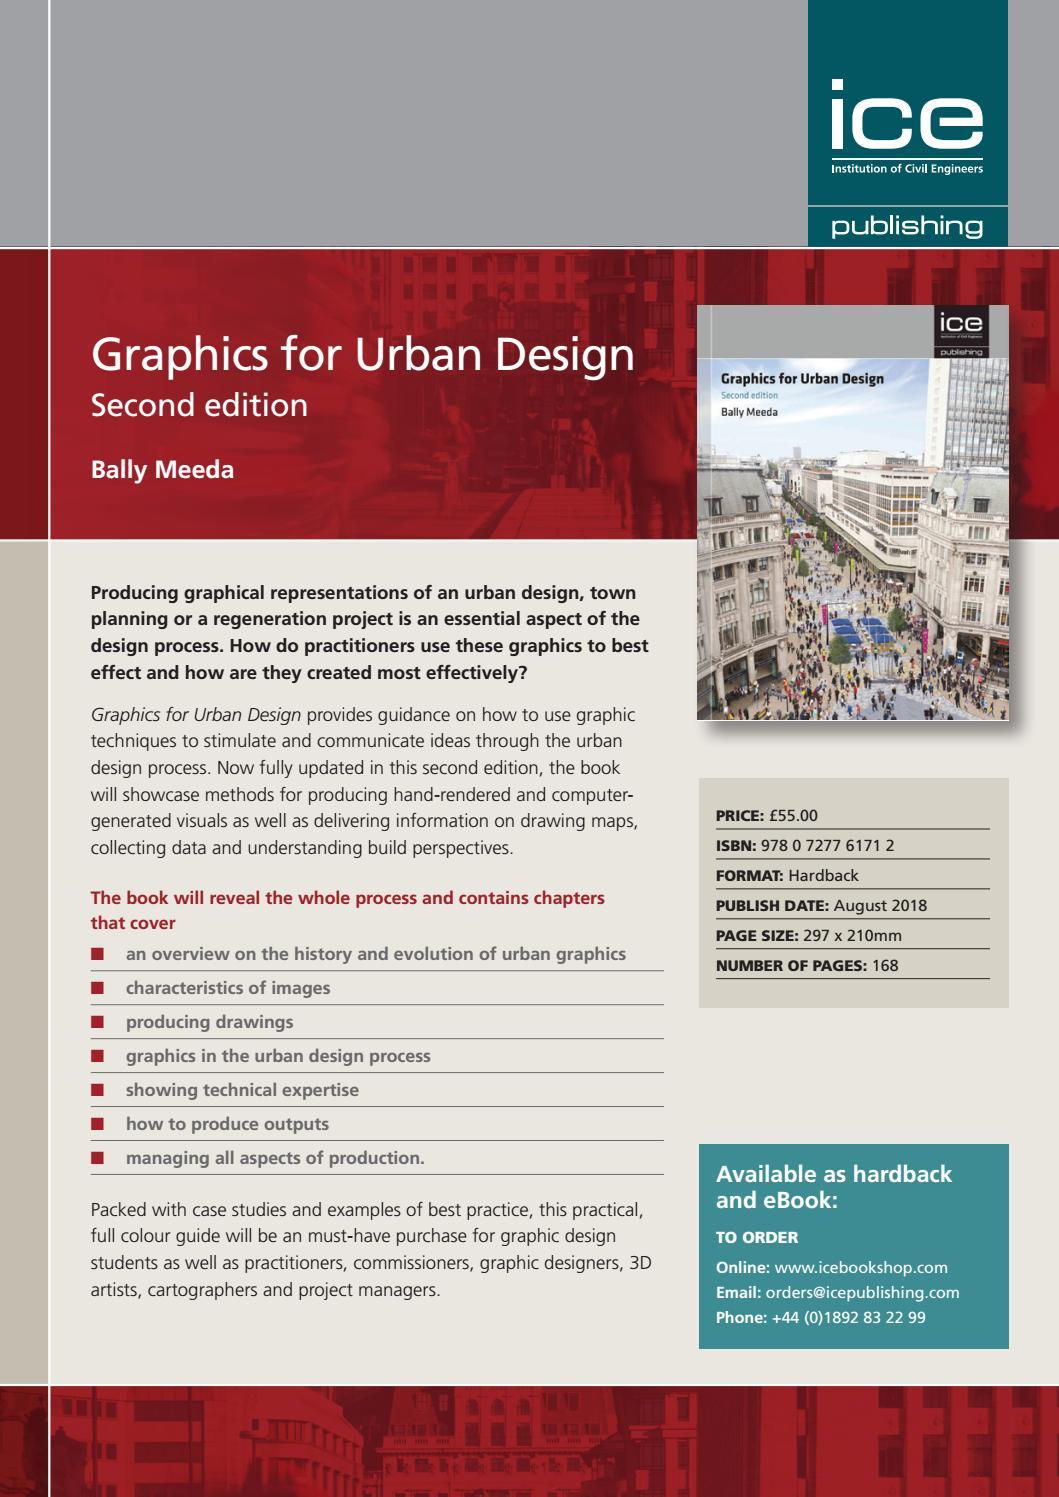 ICE_Graphics for Urban Design by SCIENTIFIC BOOKS